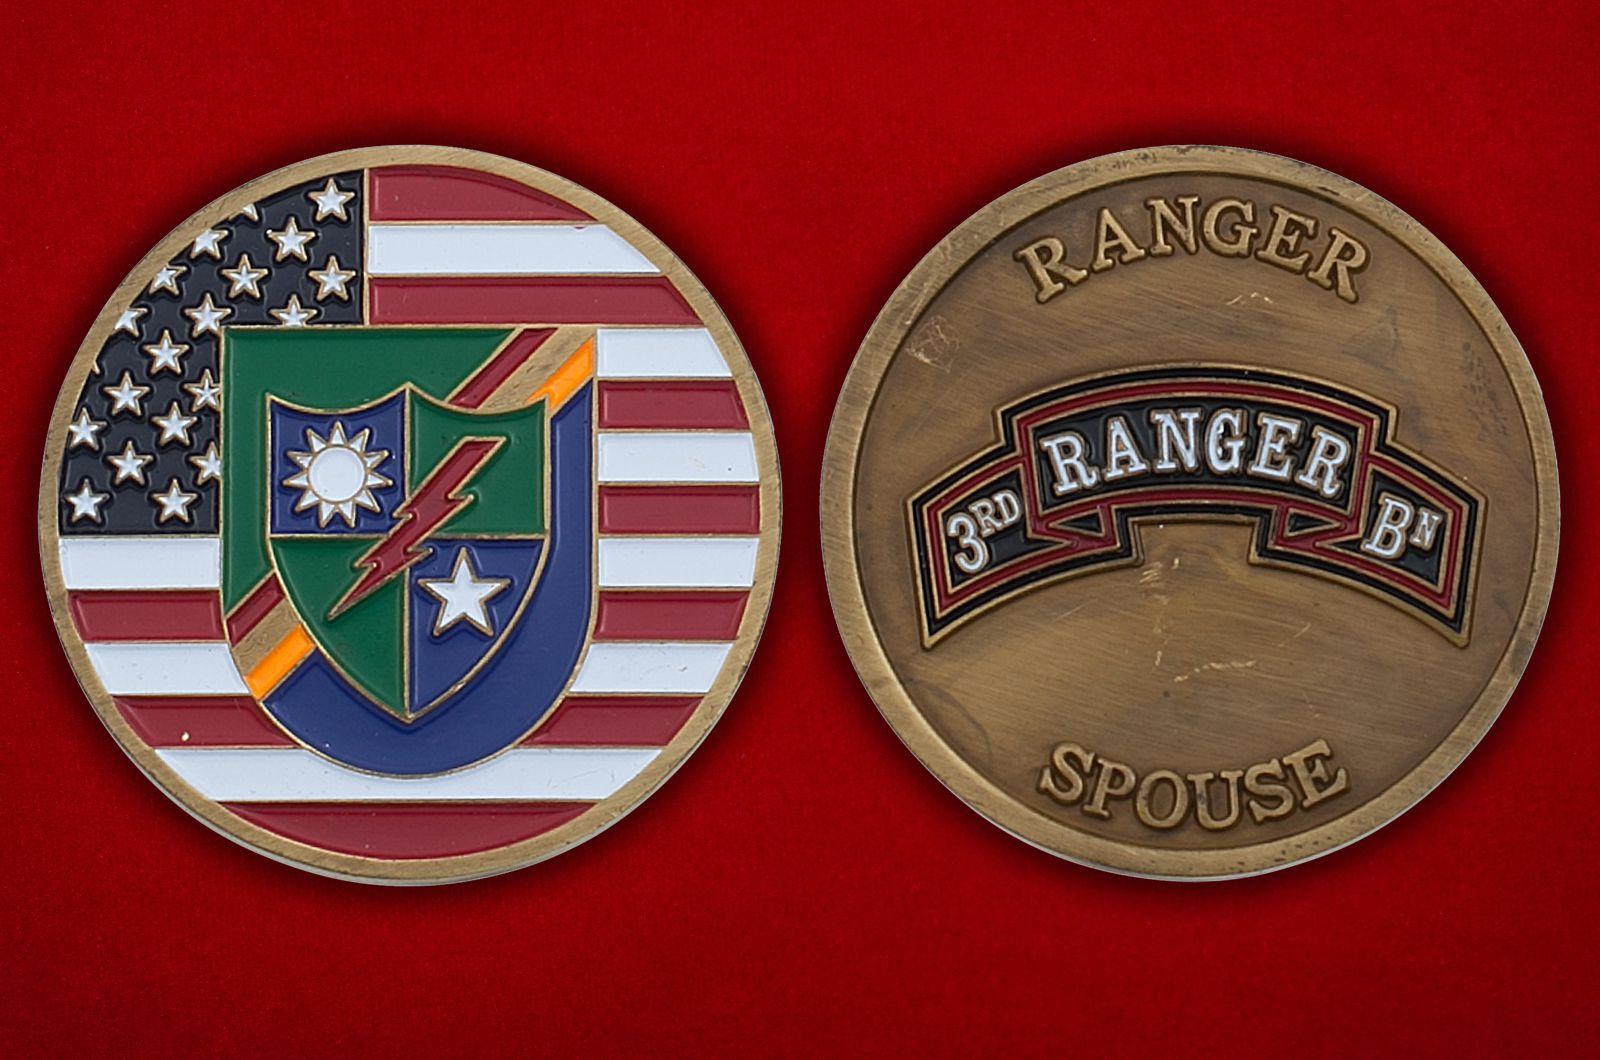 Челлендж коин 3-го батальона рейнджеров - аверс и реверс